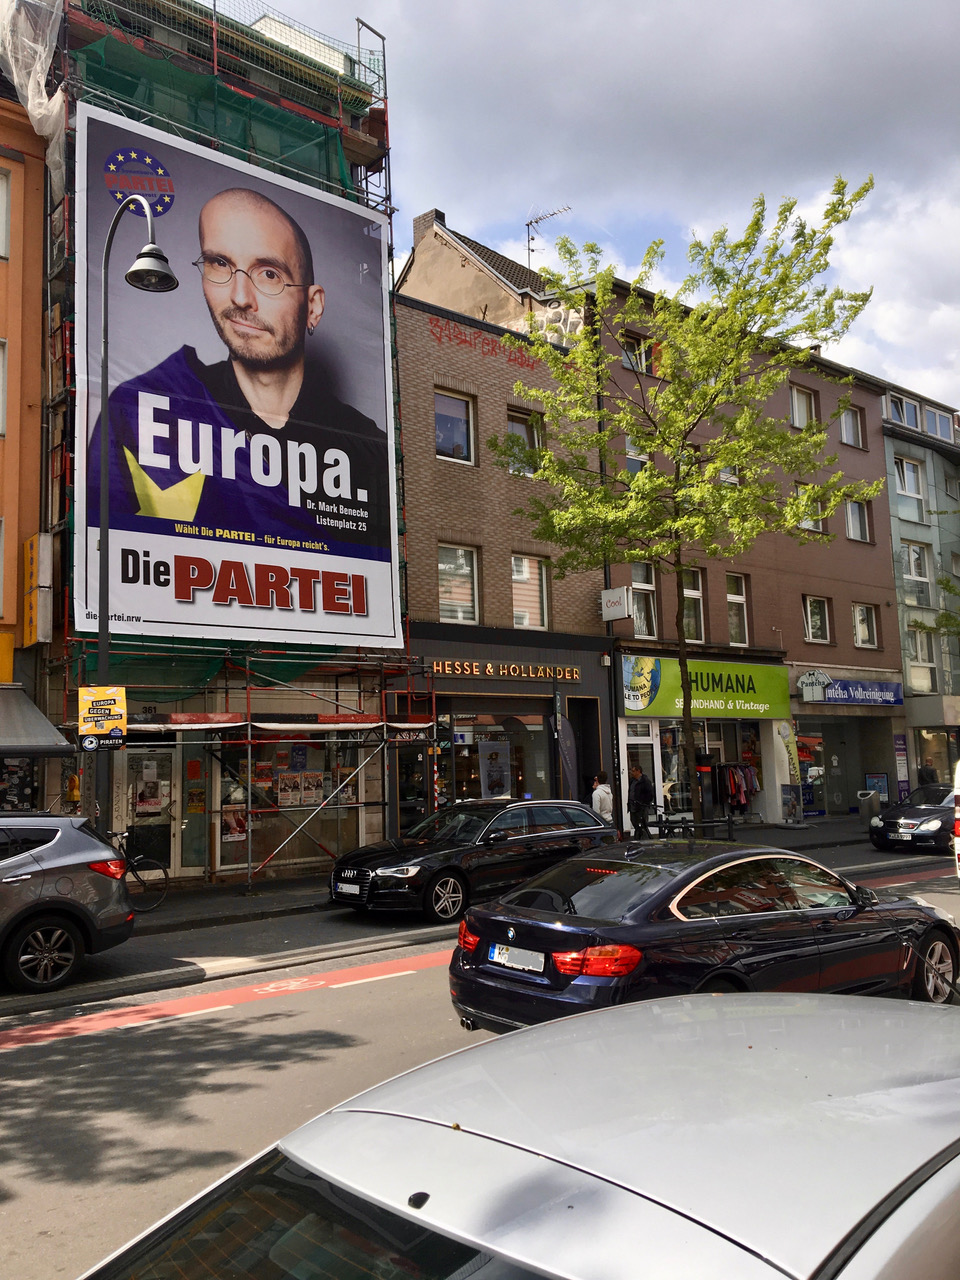 mark_benecke_PARTEI_europa_wahl_riesen_poster_venloer_strasse_koeln.jpeg